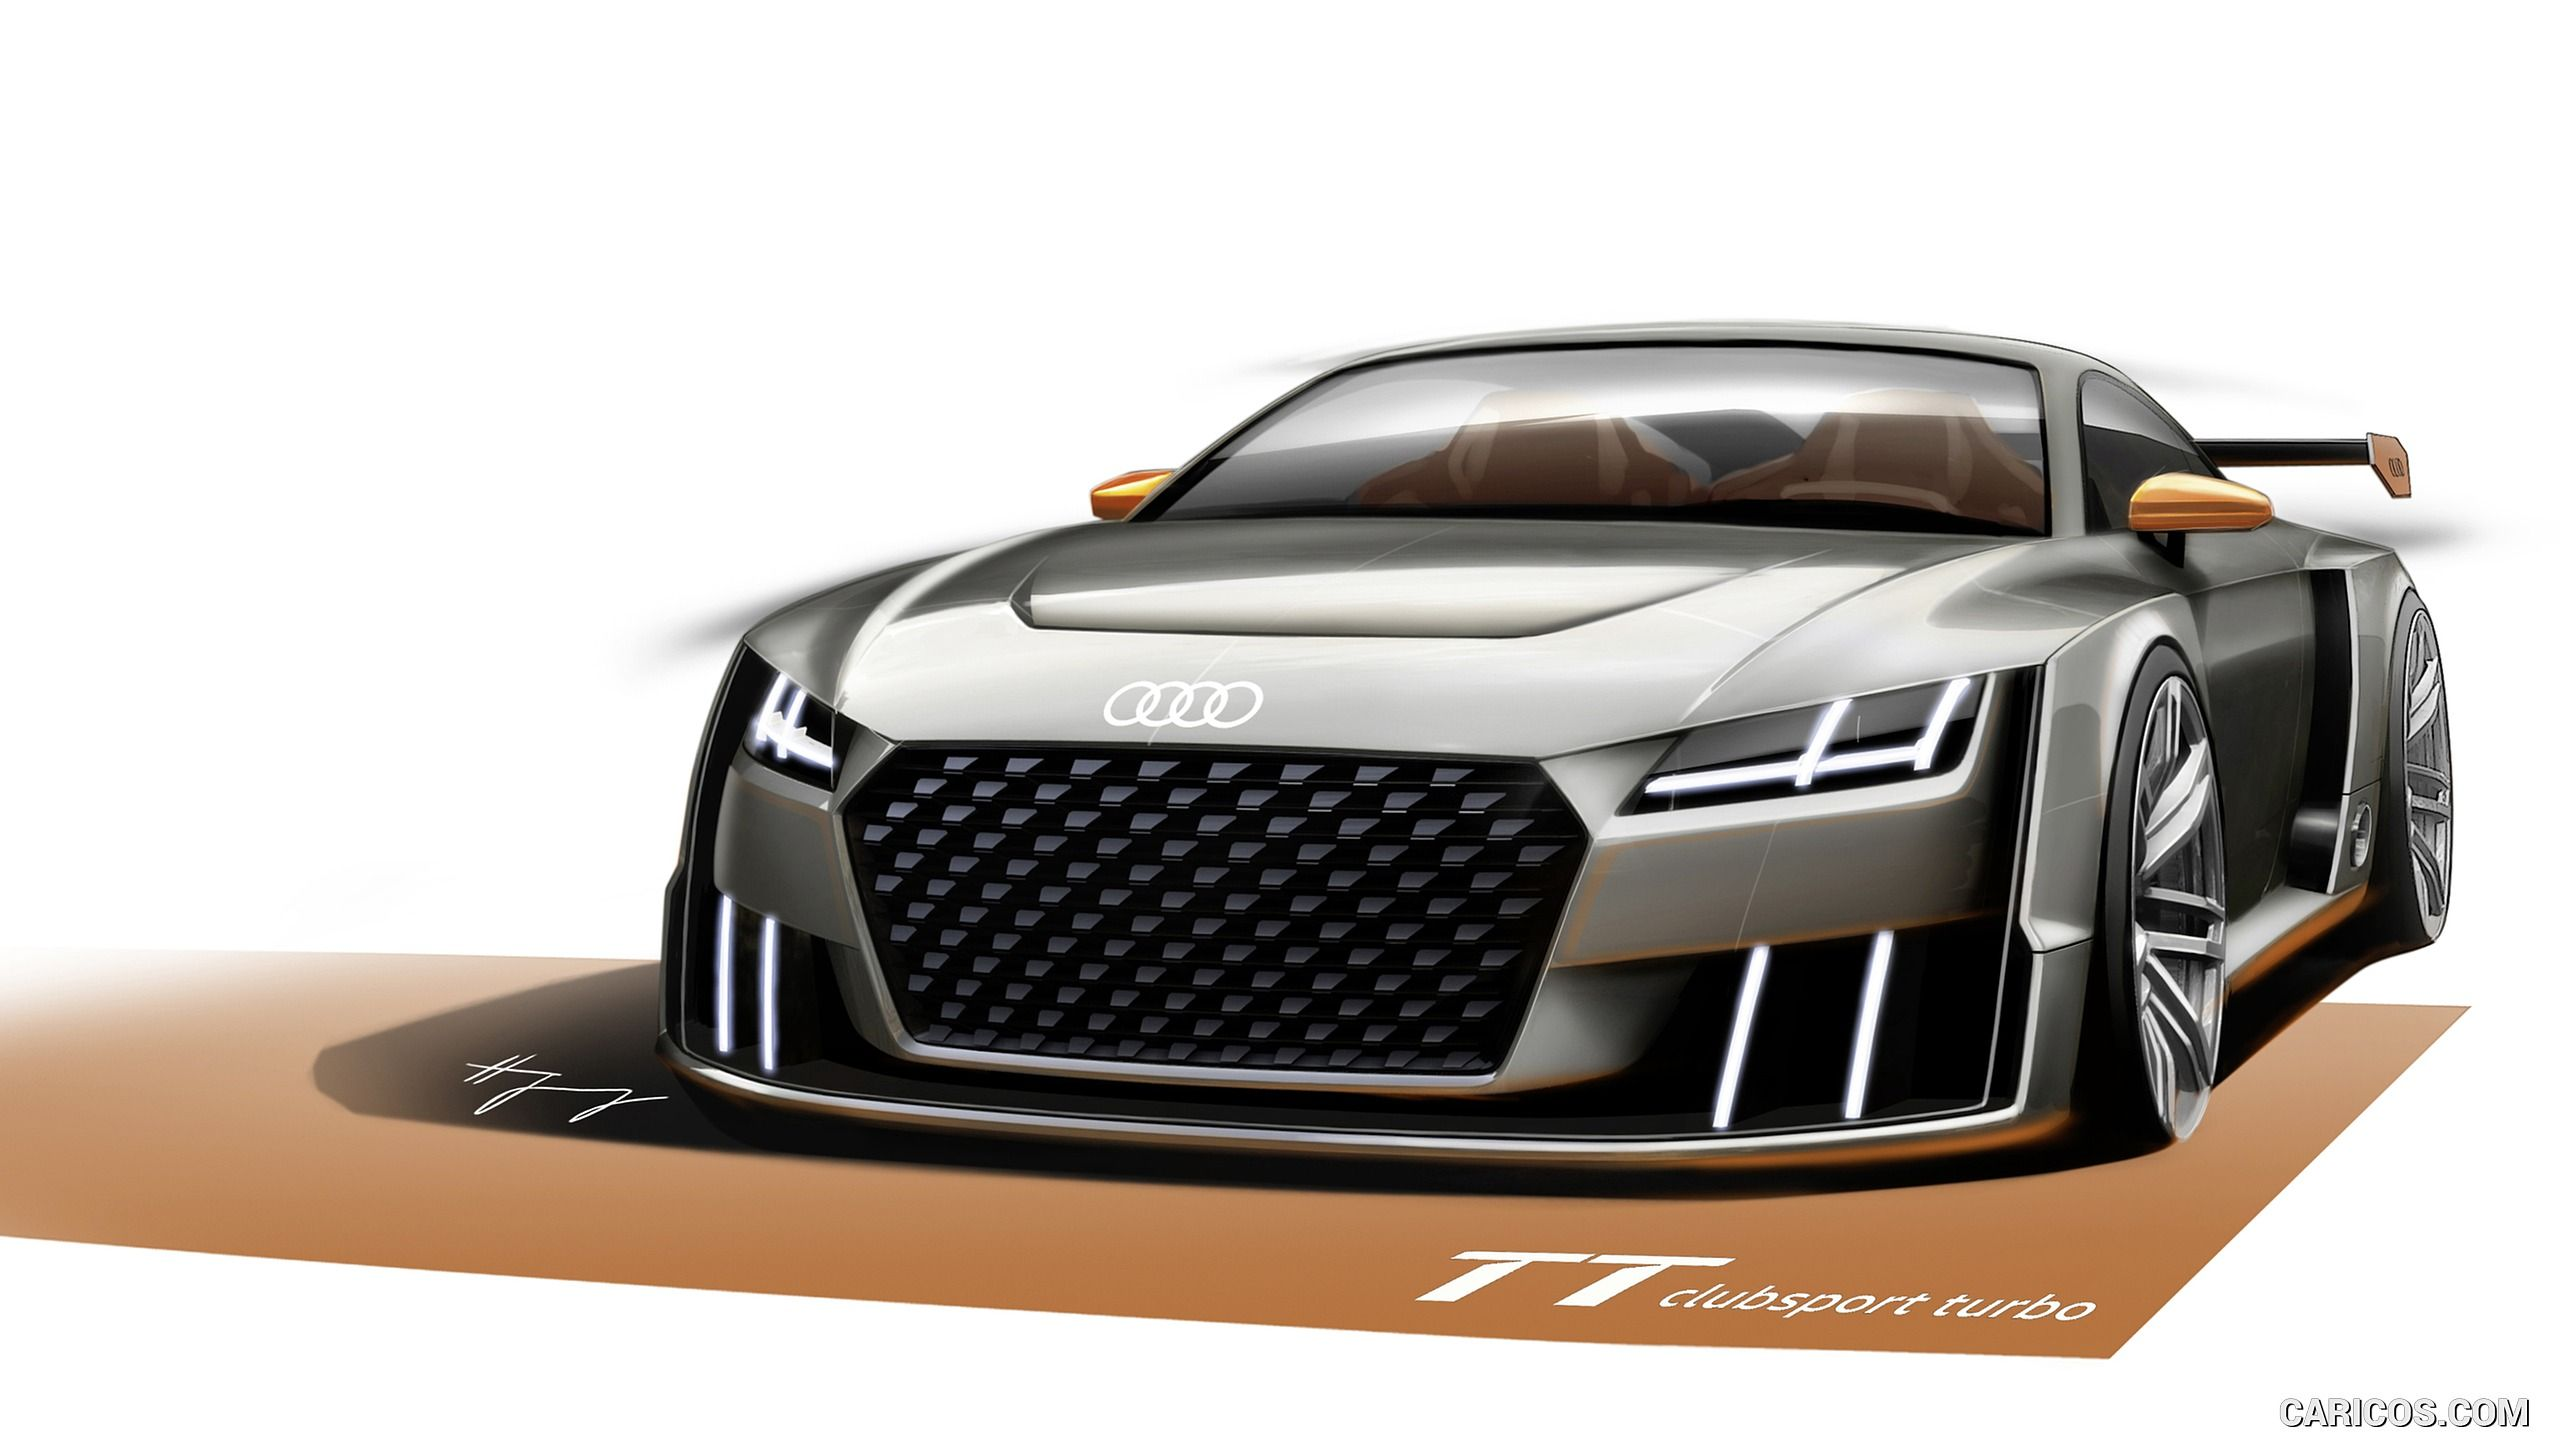 2015 Audi Tt Clubsport Turbo Concept Wallpaper